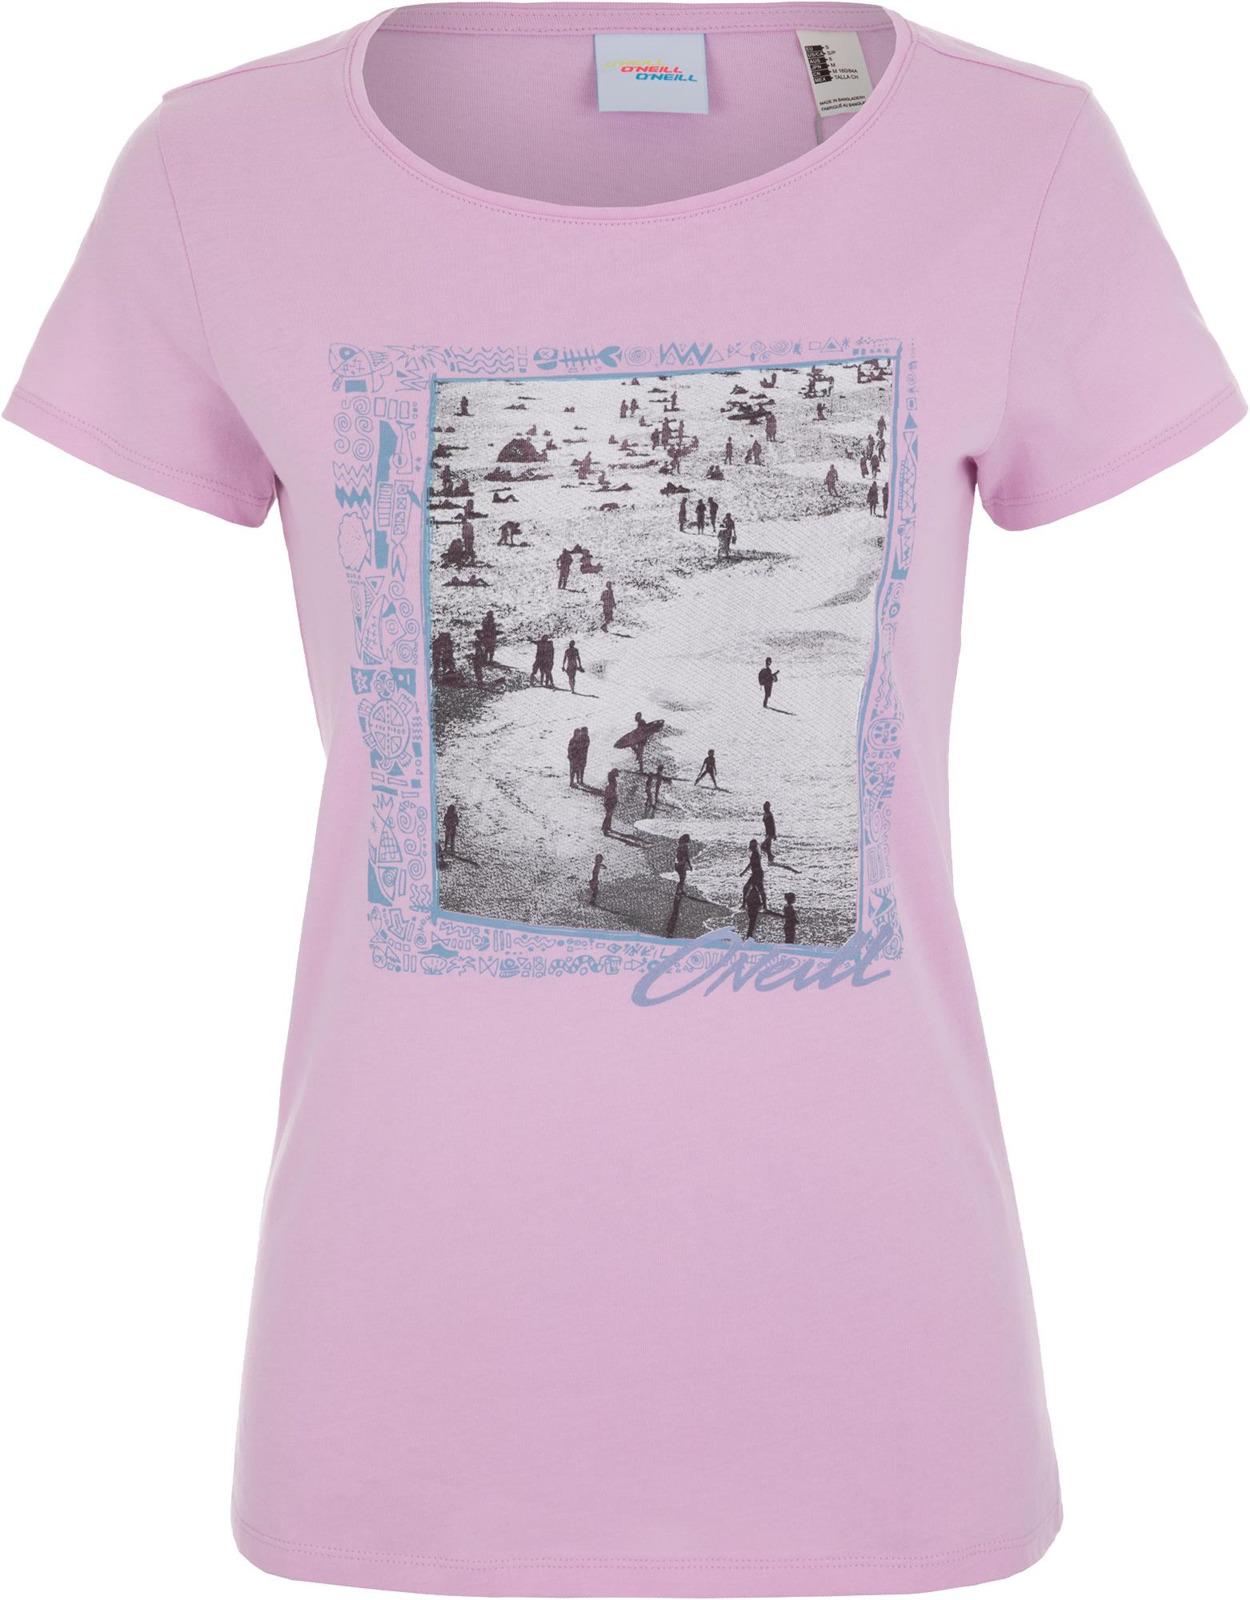 Футболка O'Neill женская футболка brand new t o emoji big hero shirt